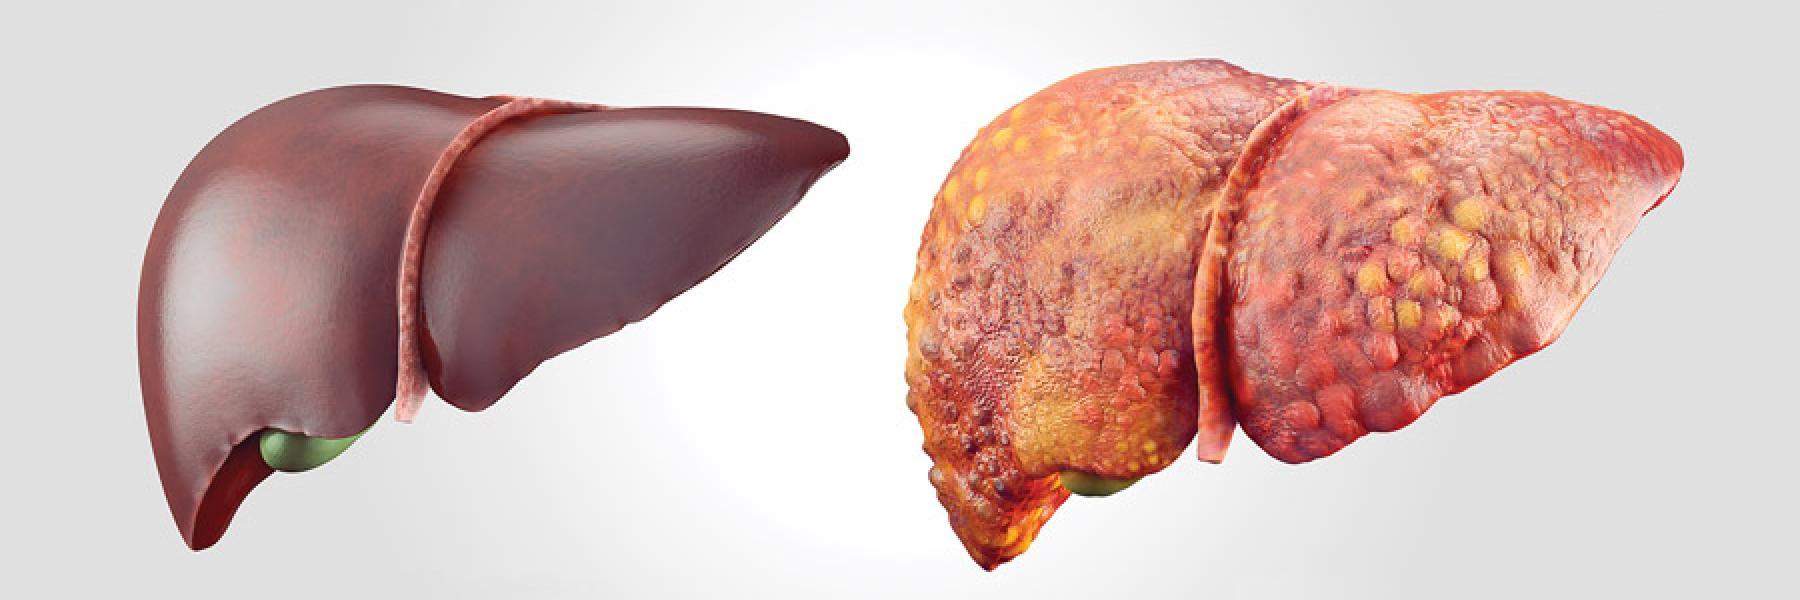 Type of Liver Hepatitis, Acute Hepatitis, Chronic Hepatitis   Dr. Naimish  Mehta